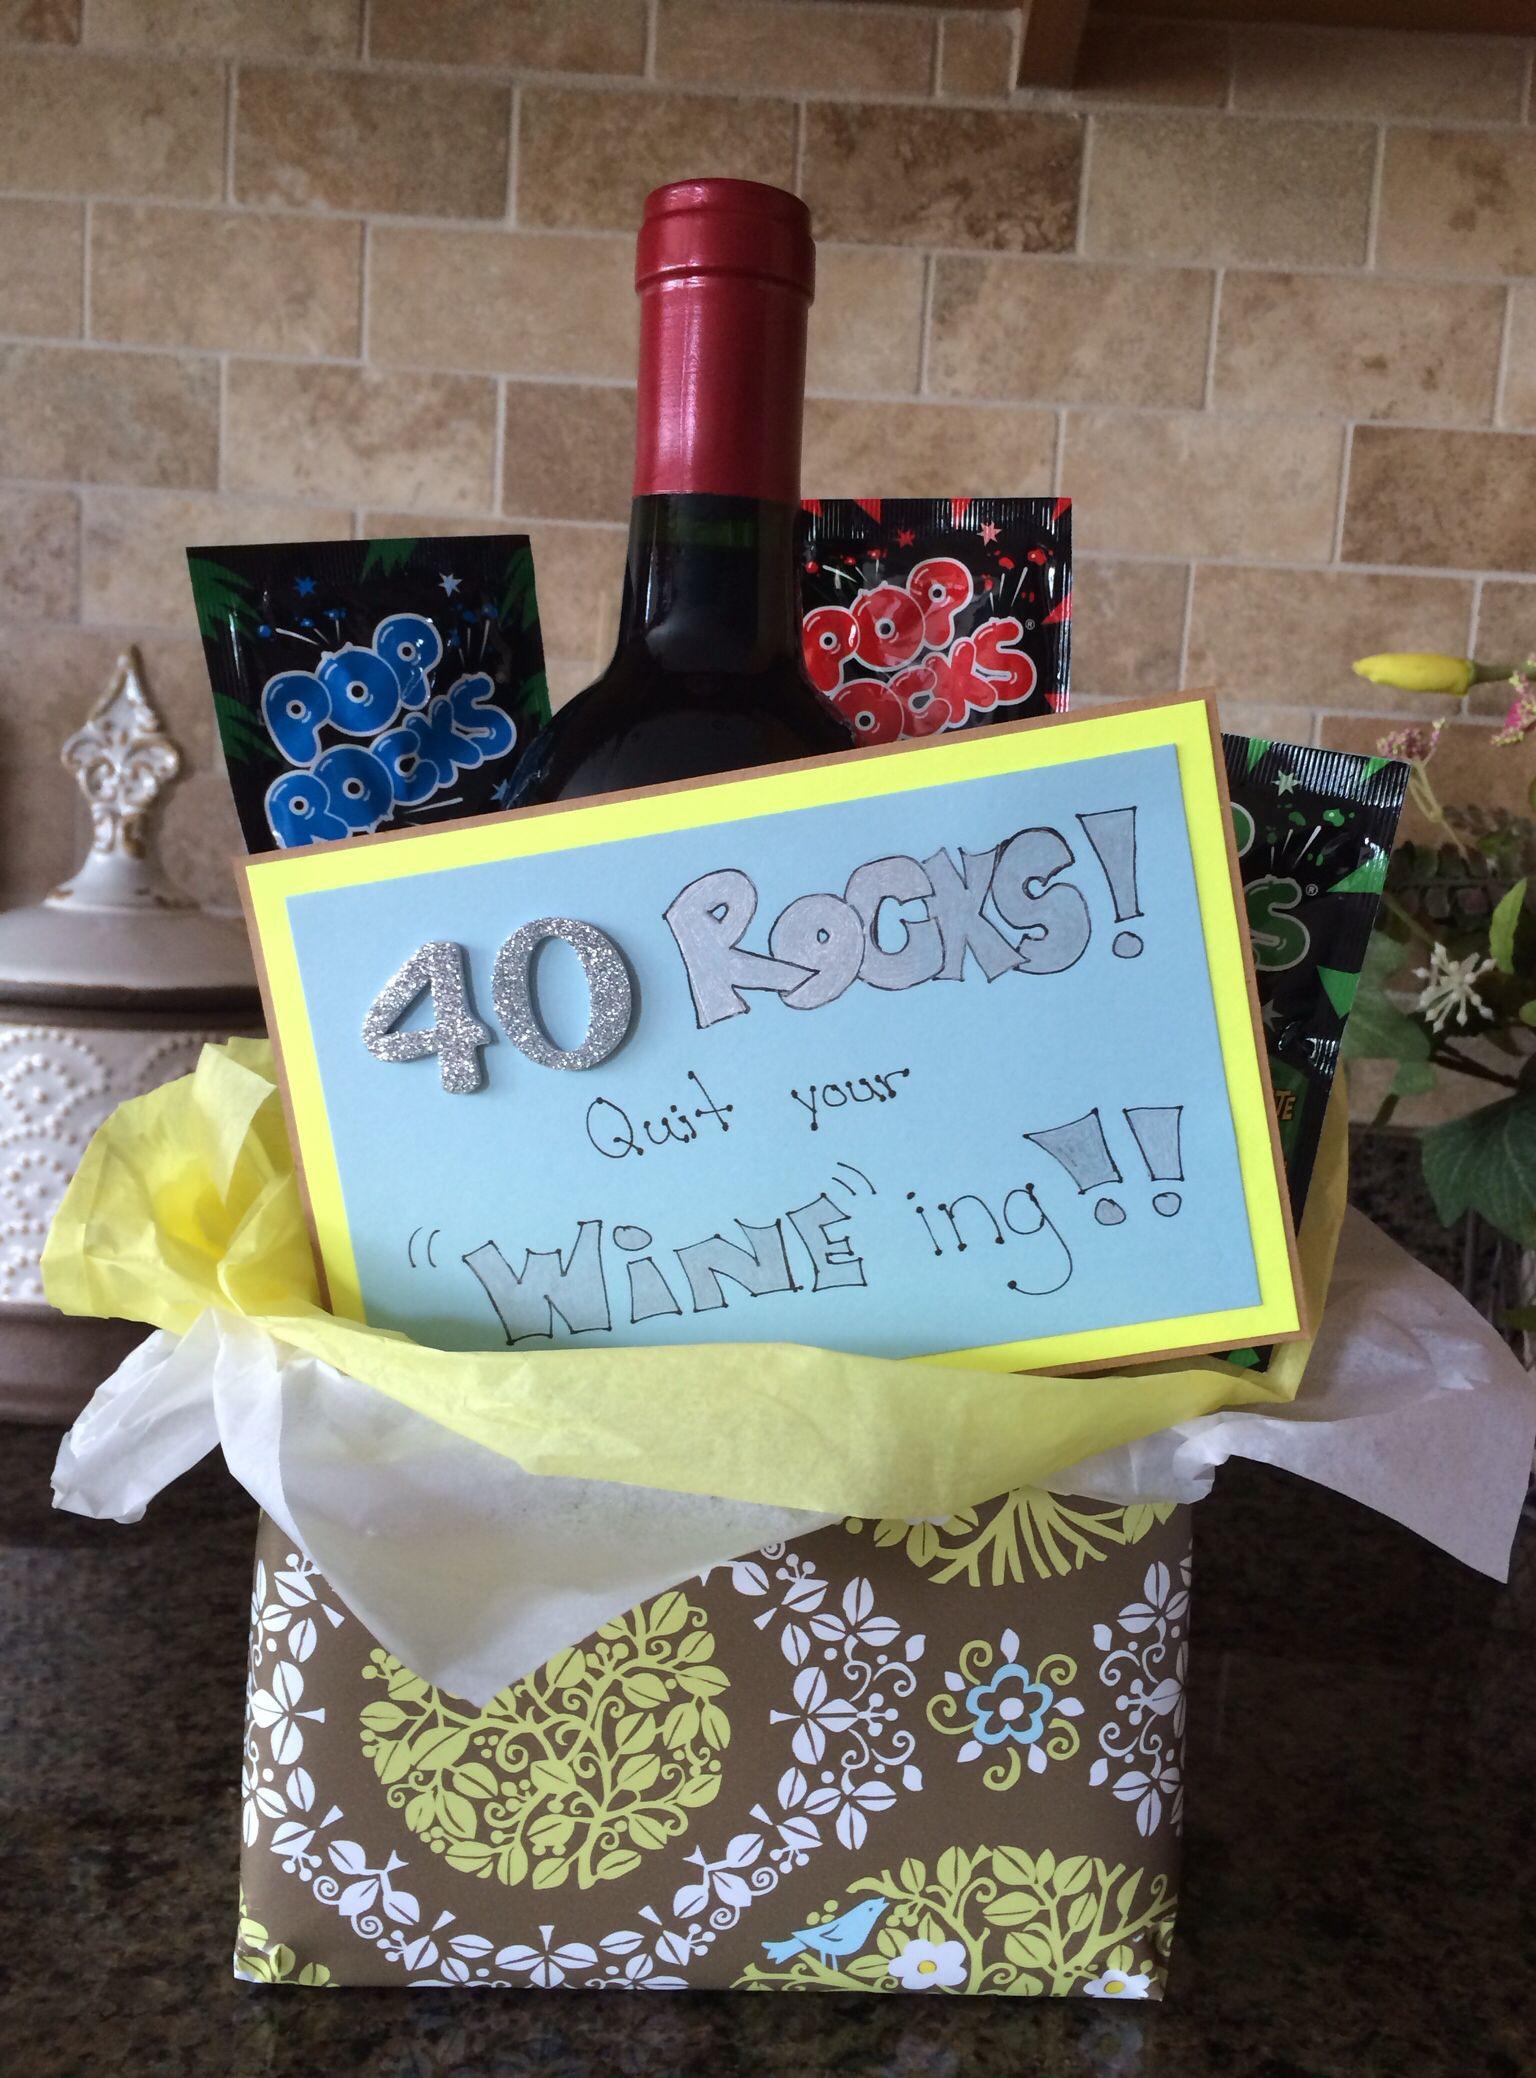 40Th Birthday Gag Gift Ideas  40th birthday t idea Creative t ideas